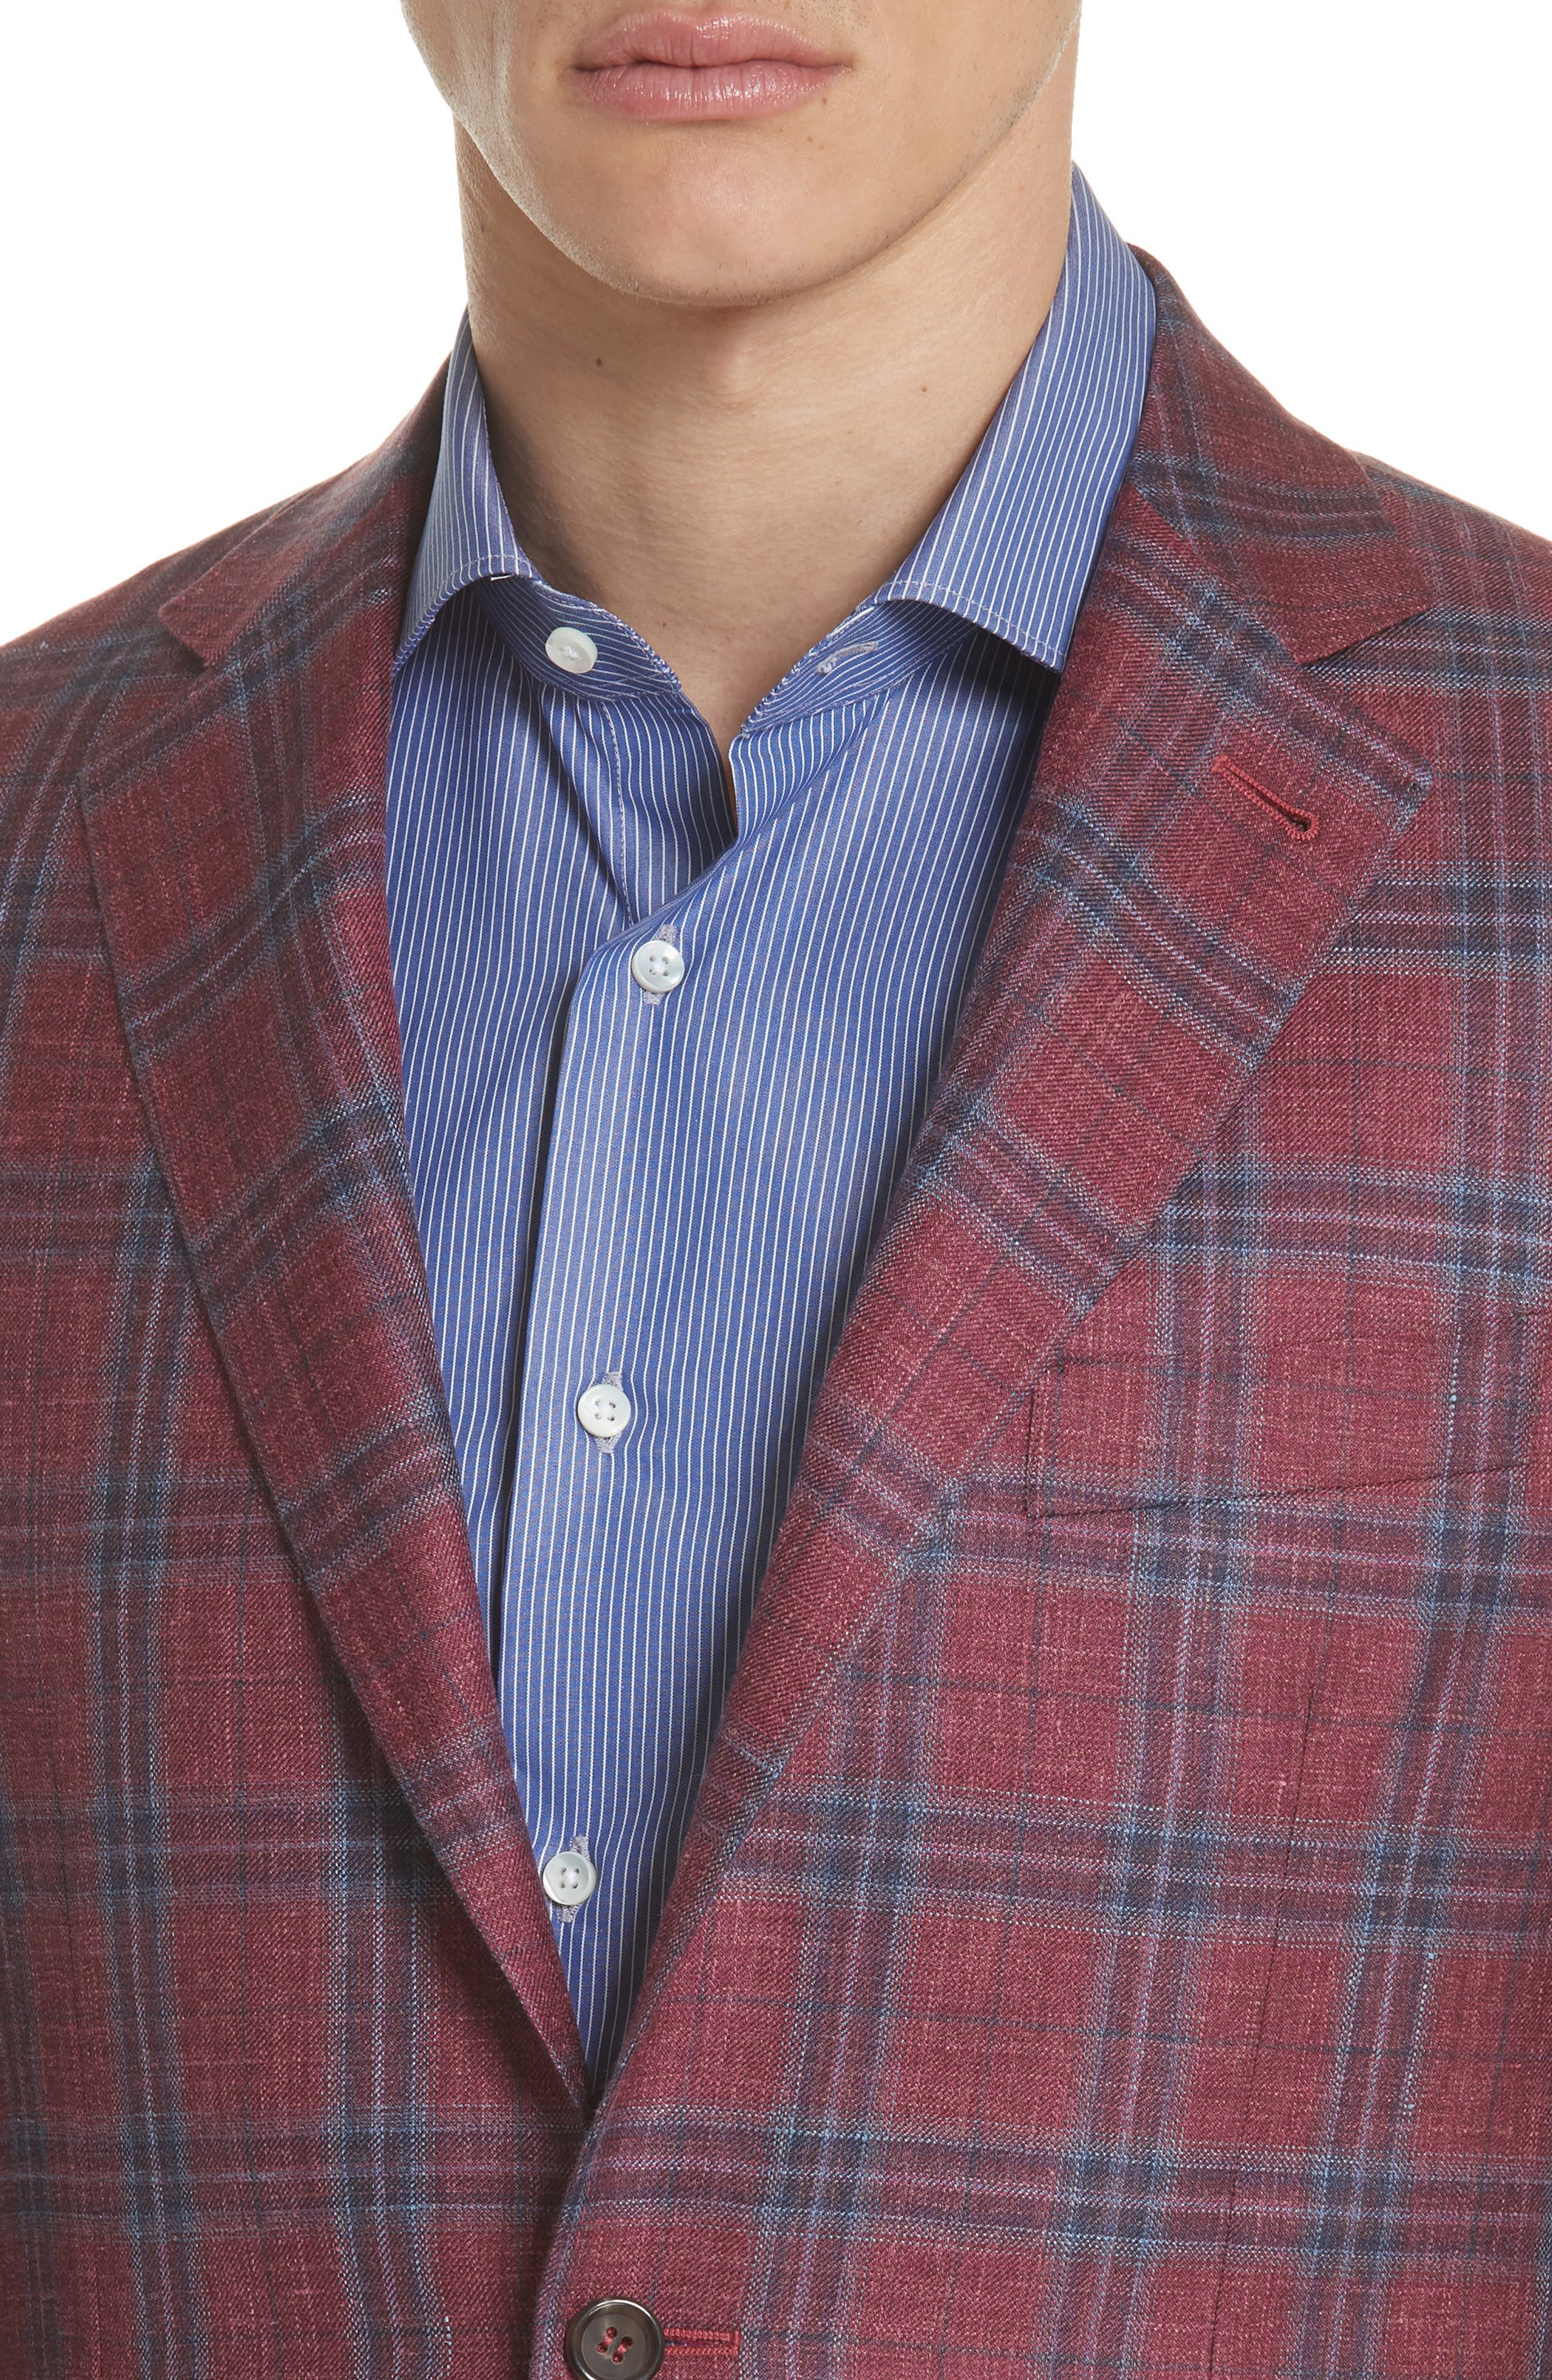 Regular Fit Wool Blend Plaid Sport Coat,                             Alternate thumbnail 4, color,